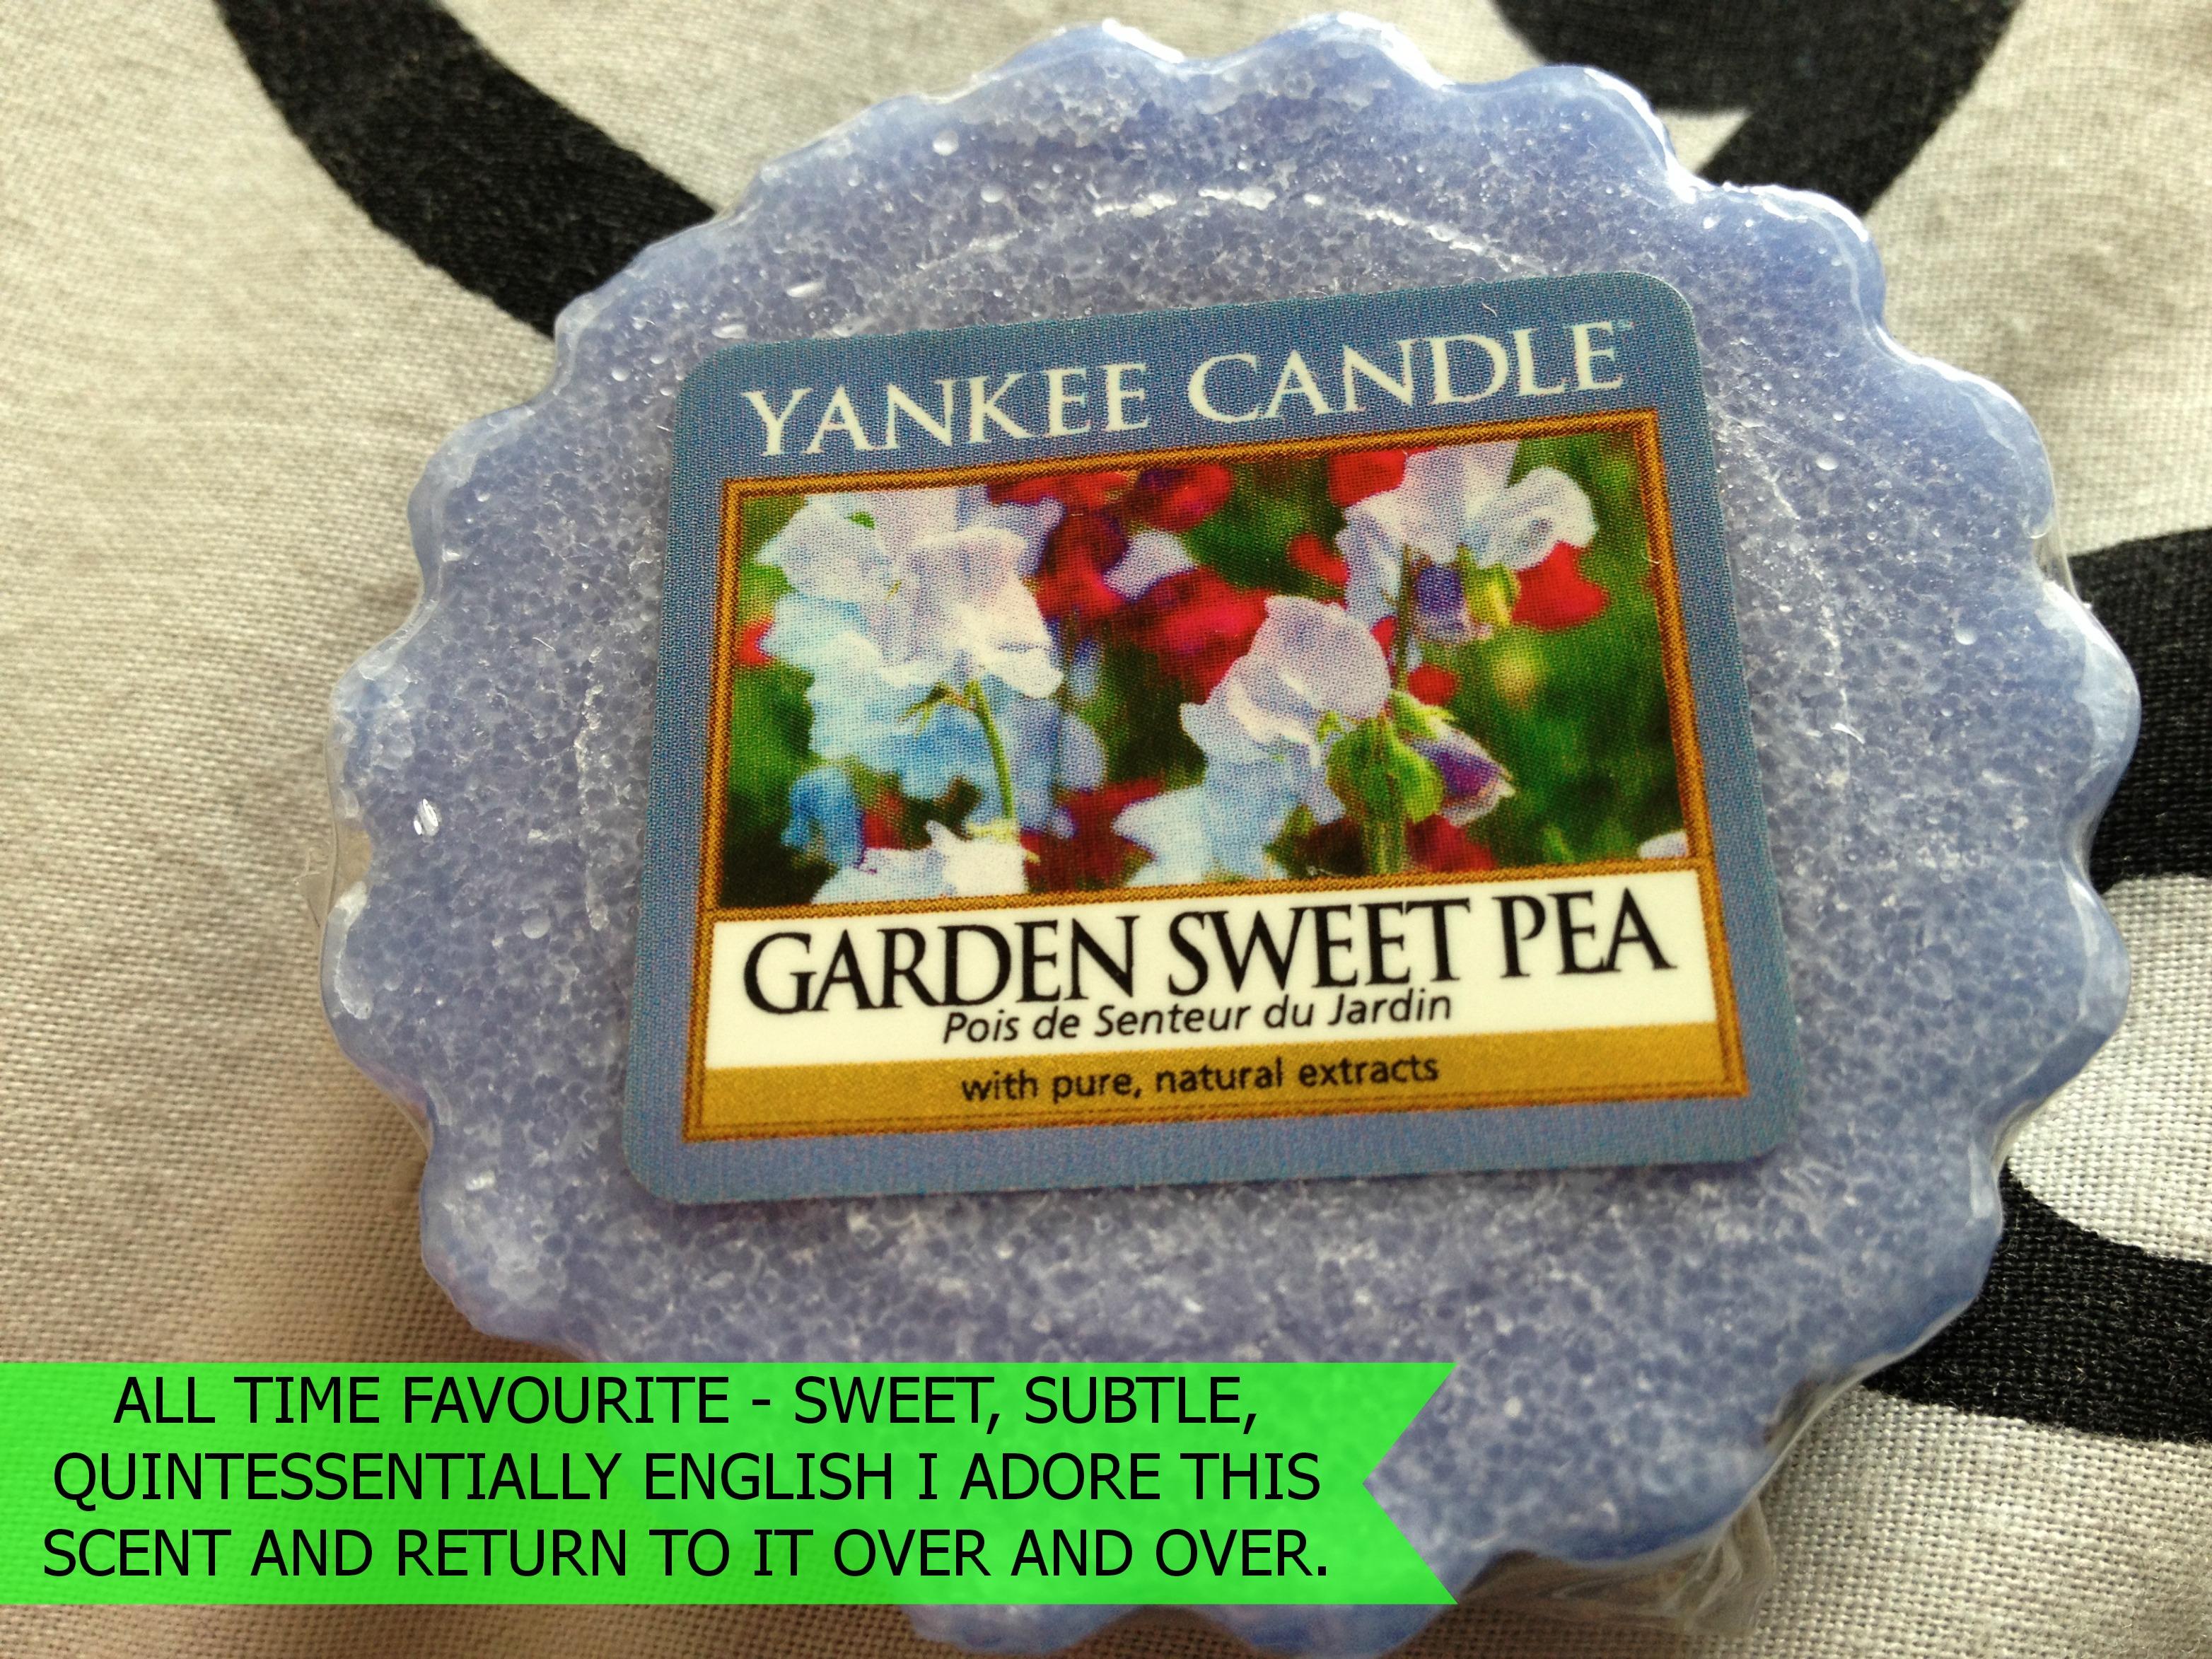 Yankee_Candle_Tart_Haul_Garden_Sweet_Pea